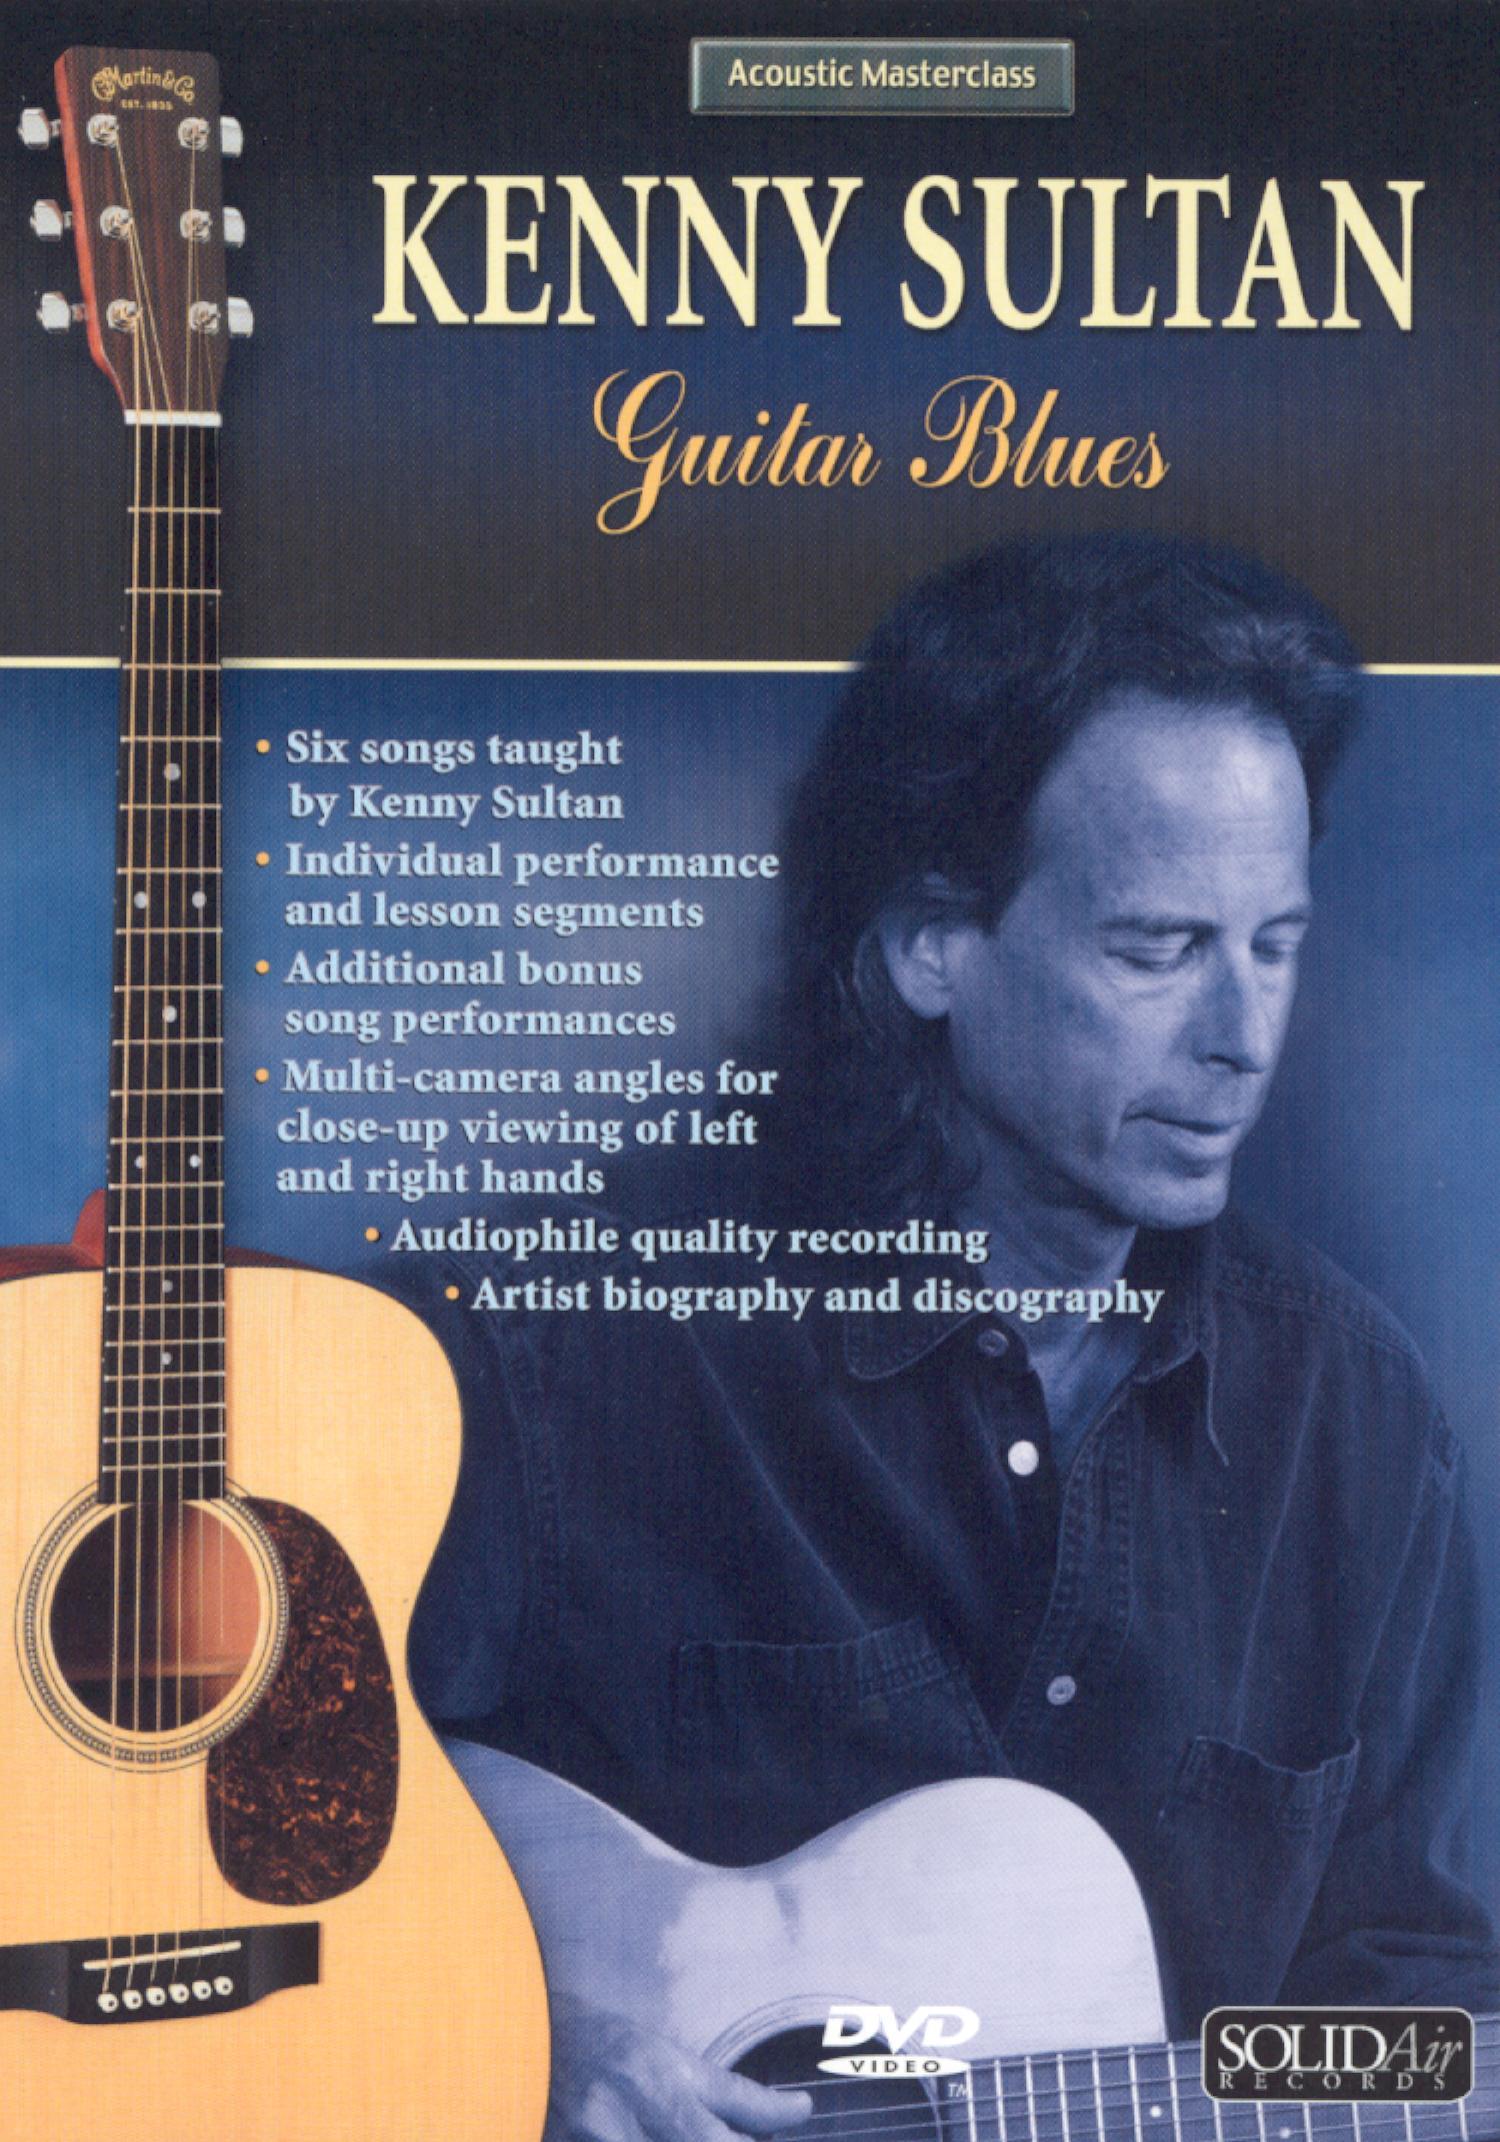 Acoustic Masterclass Series: Guitar Blues